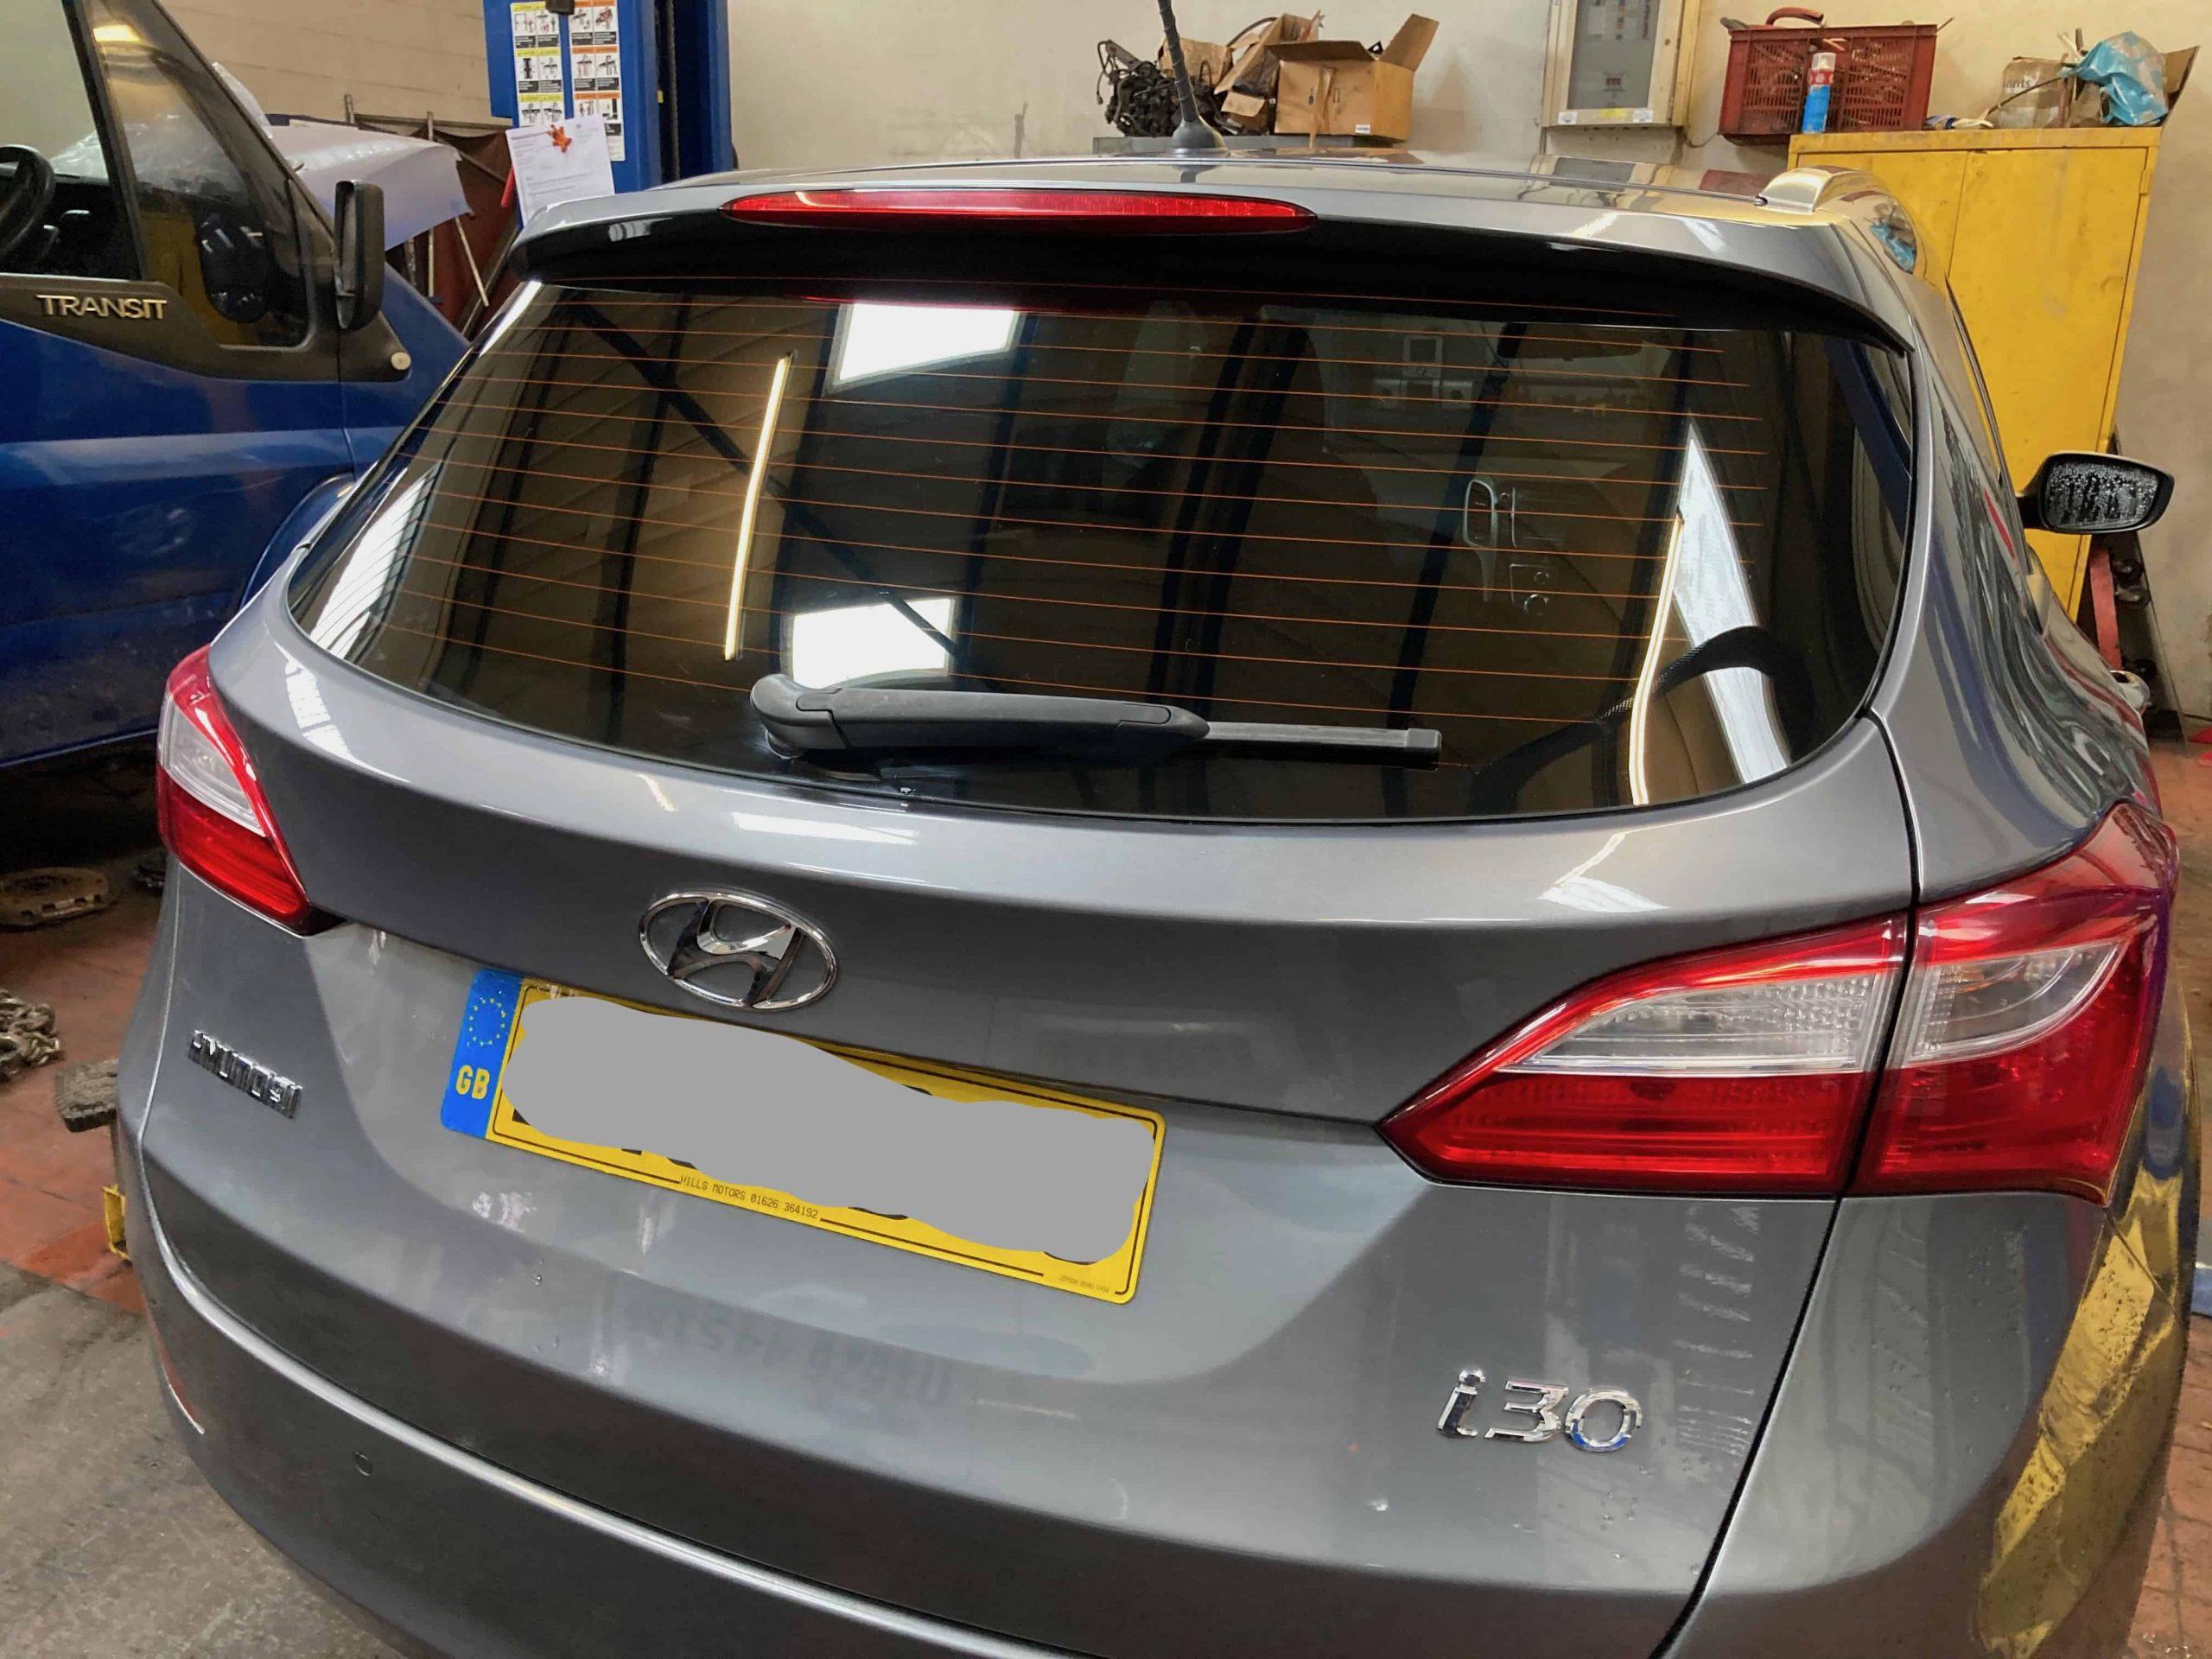 Hyundai i30 window tint